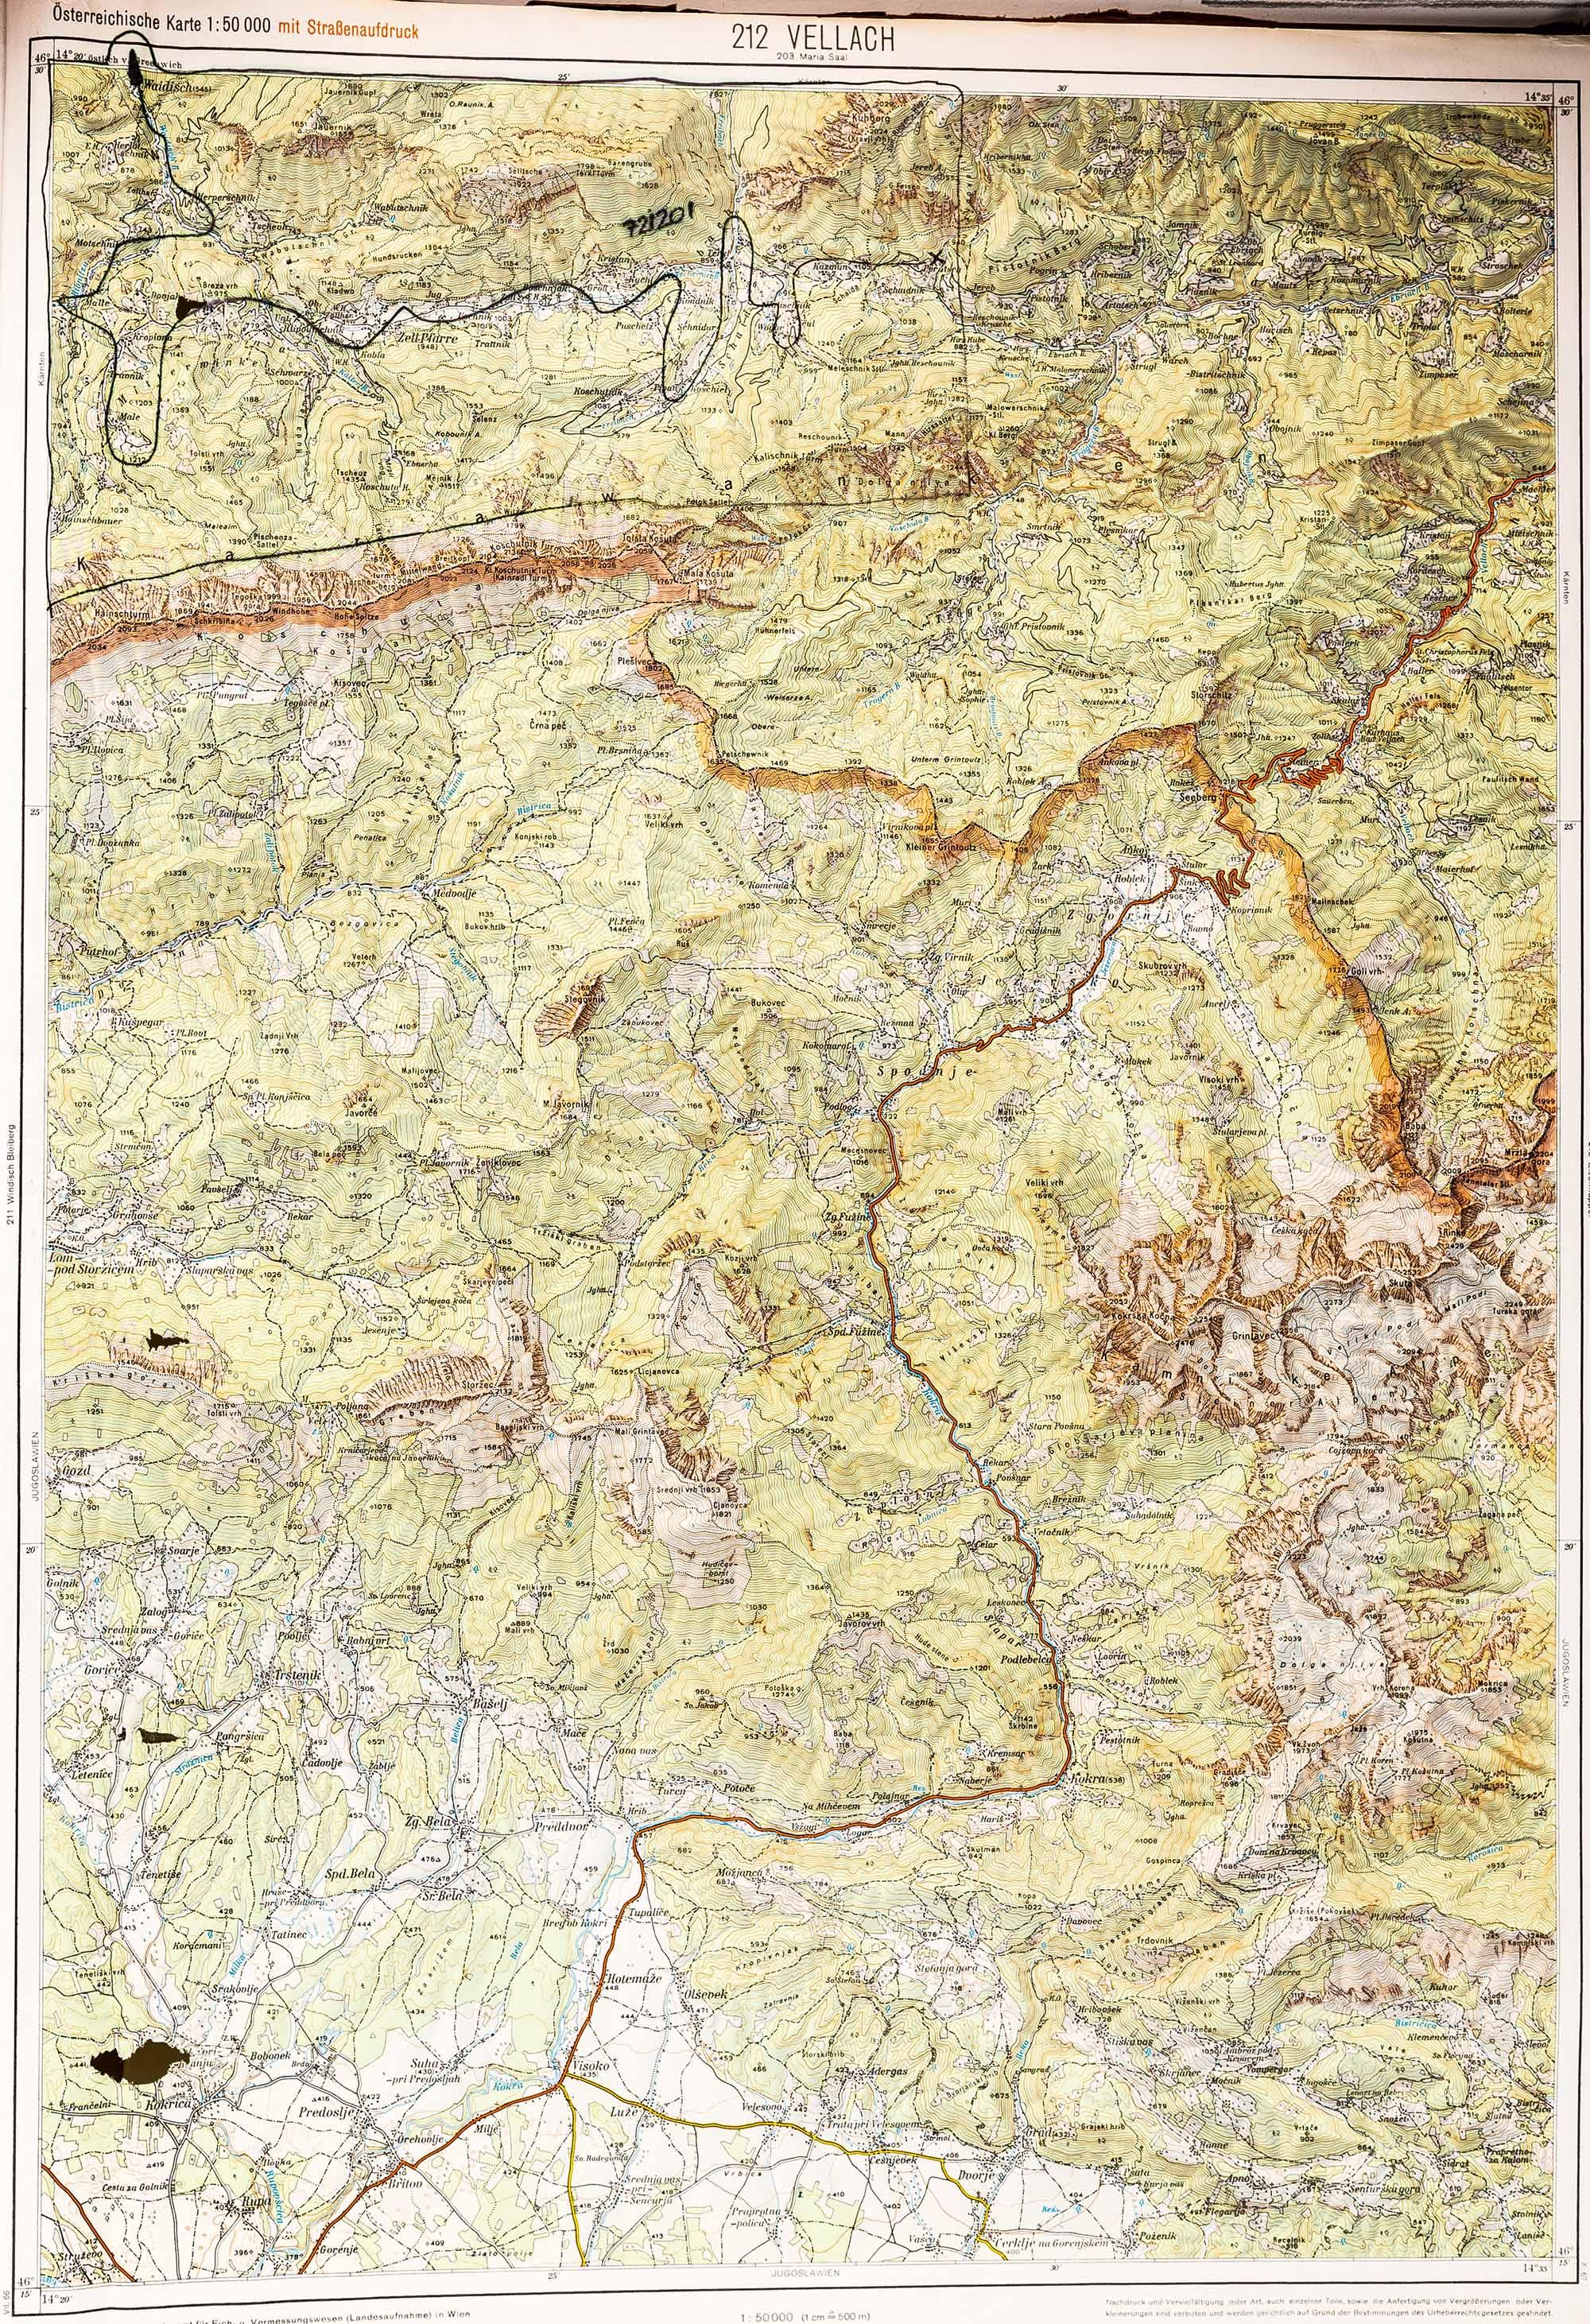 1975-1979 Karte 212